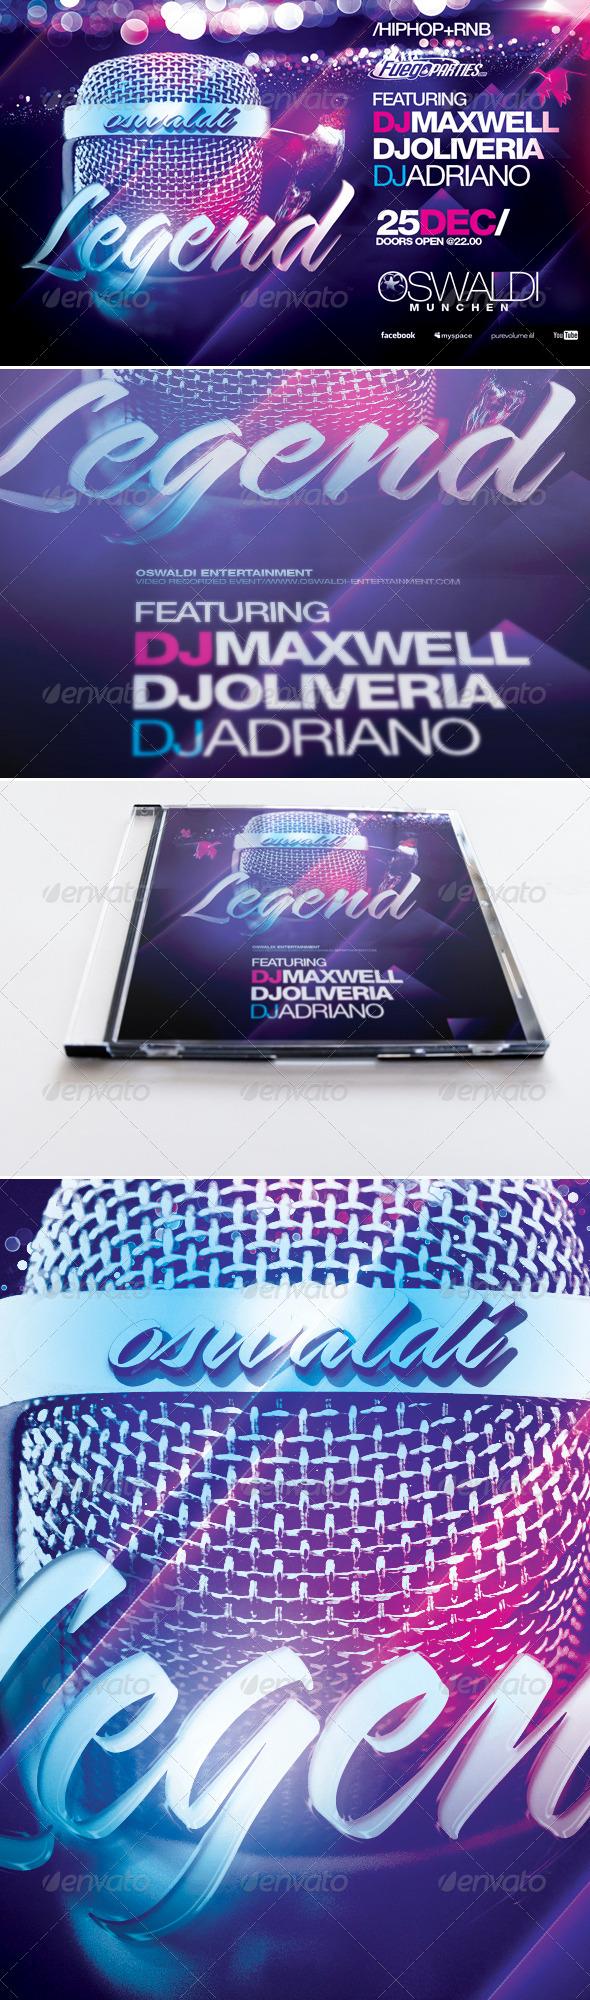 GraphicRiver Legend Flyer & Mixtape Cover 5237275